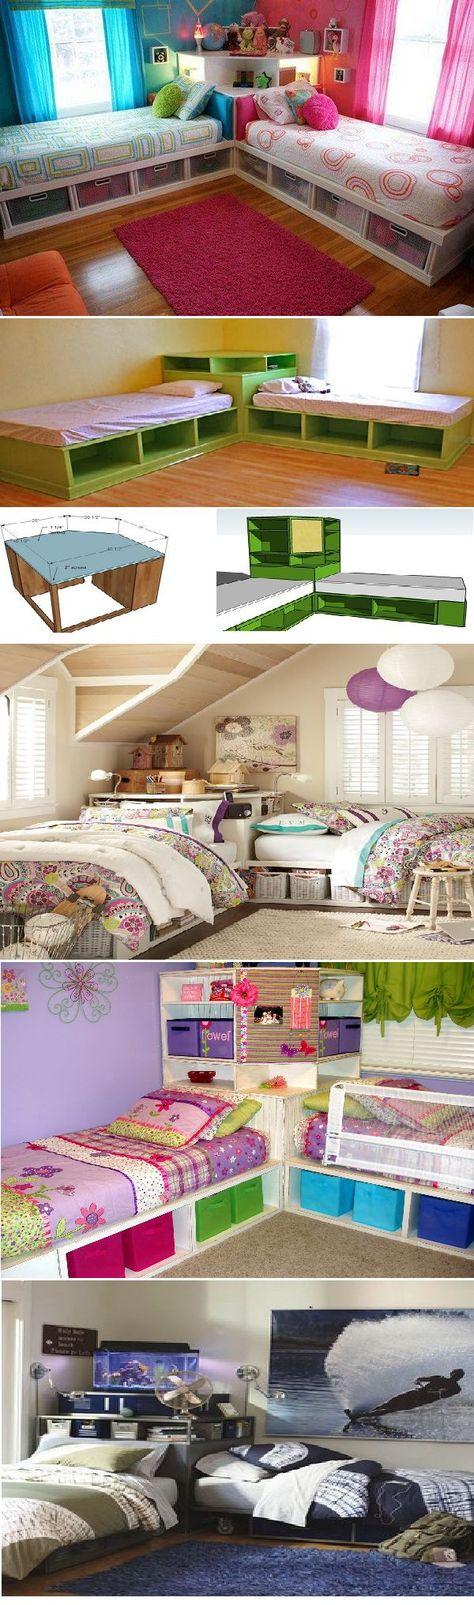 DIY Twin Corner Beds With Storage - Interior Style